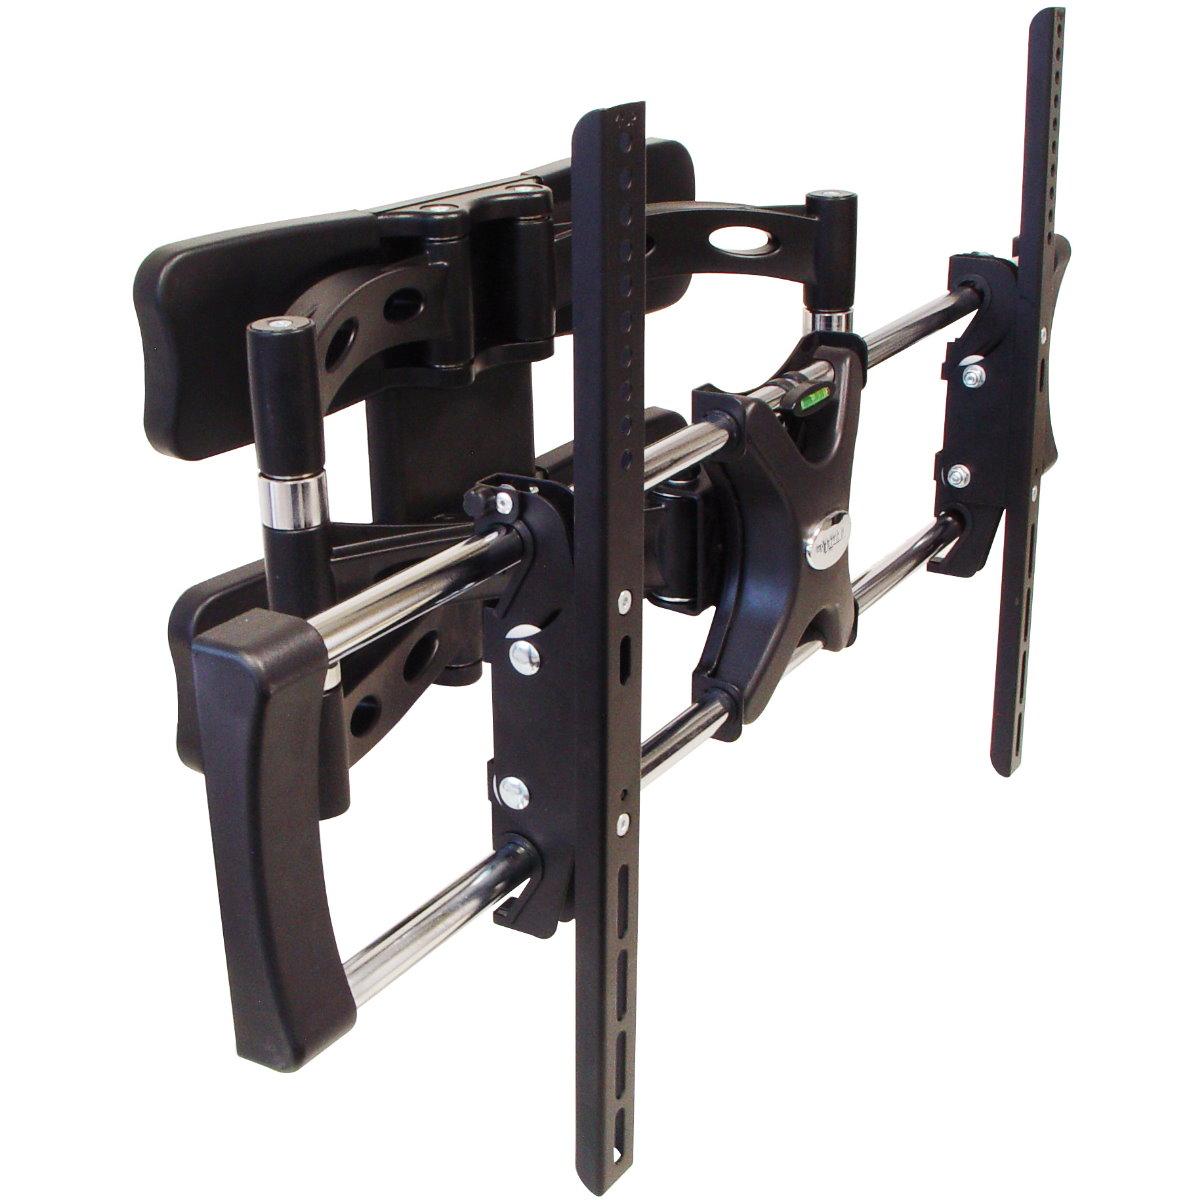 Wandhalterung-LCD-TV-Plasma-TFT-Wandhalter-TV-LED-Wand-Halter-Profi-26 ...